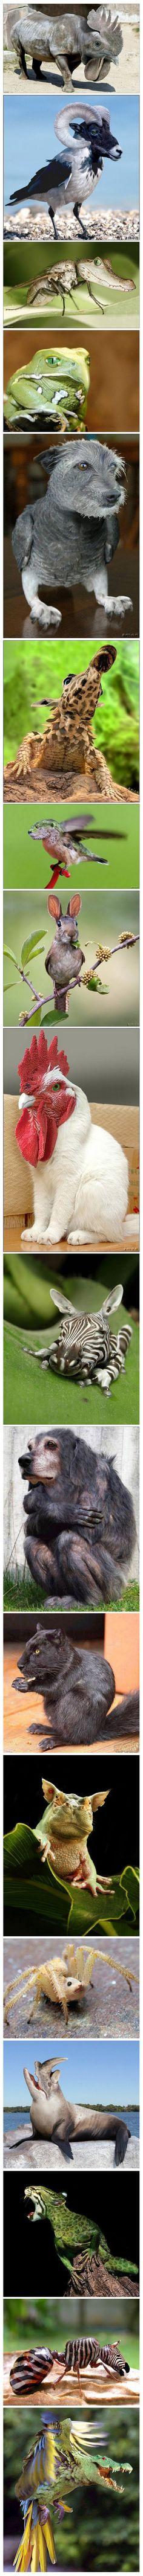 love these hybrid animals